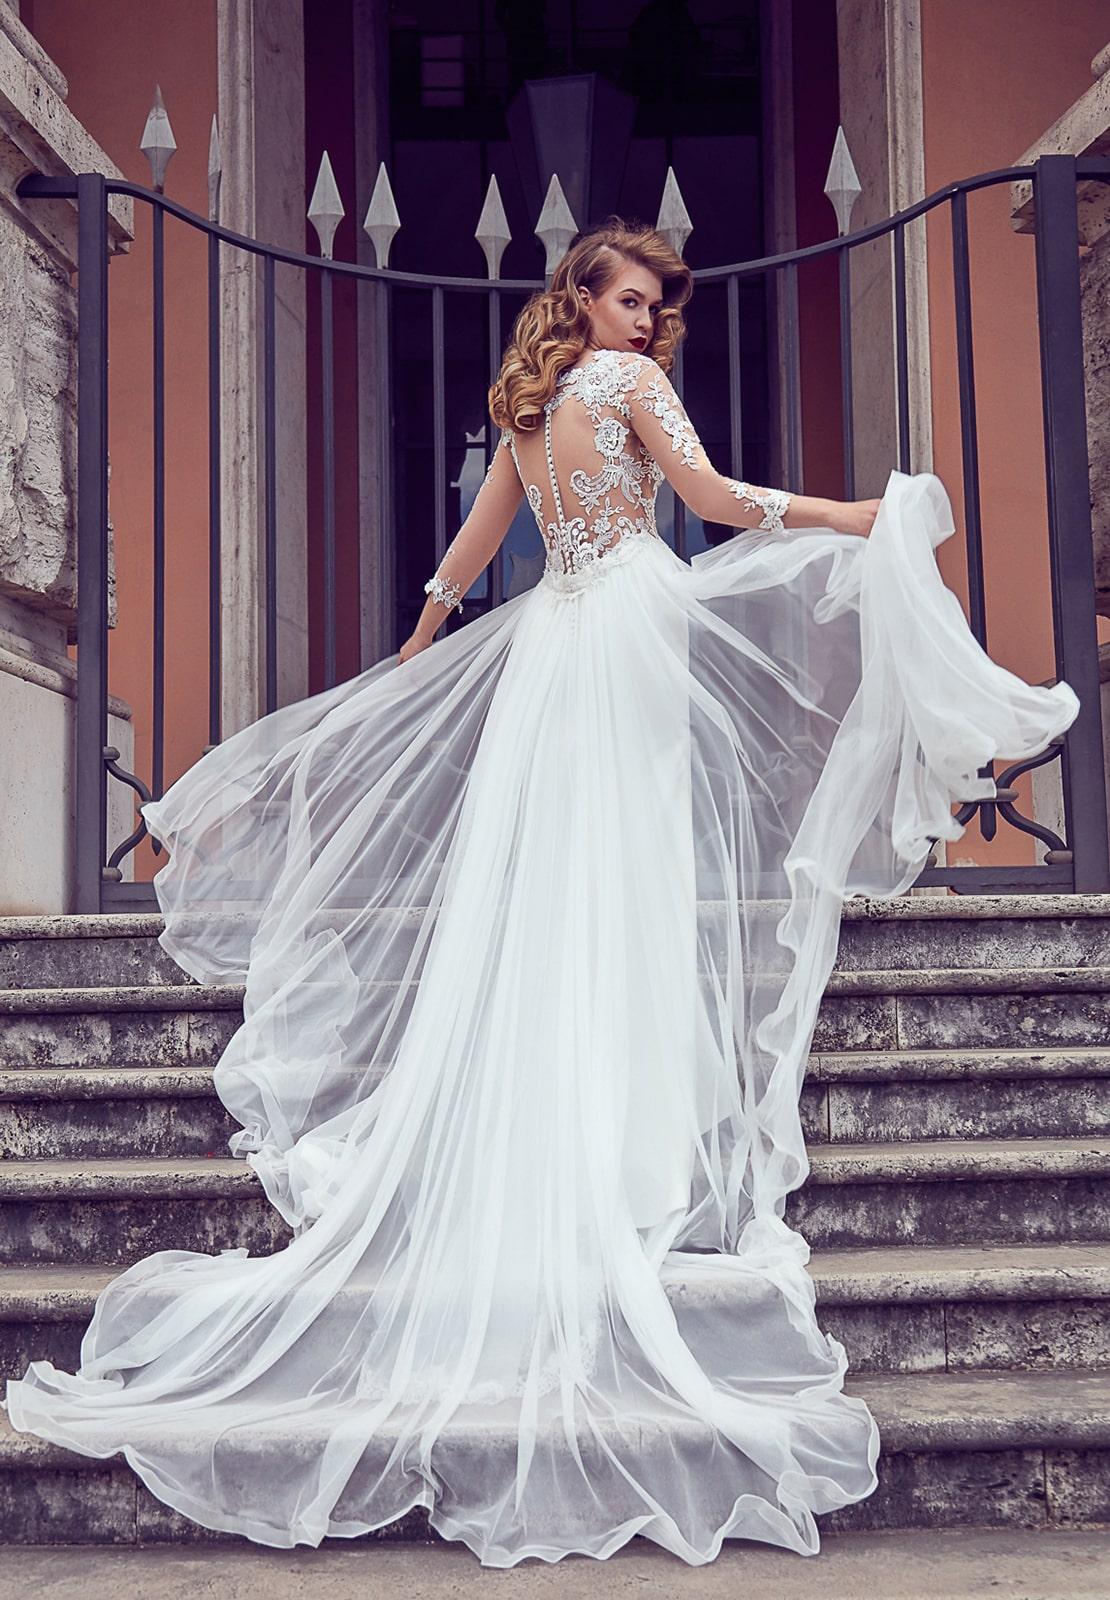 Naomi Model - Colectia Roma - Adora Sposa (3)